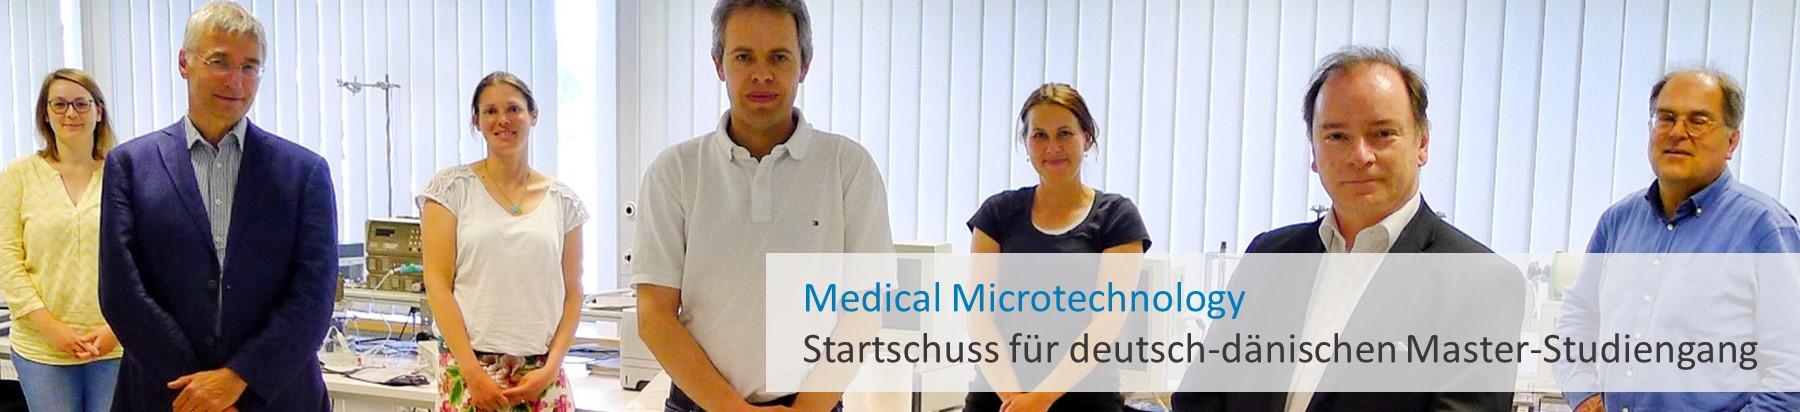 Medical Technology neuer internationaler Master